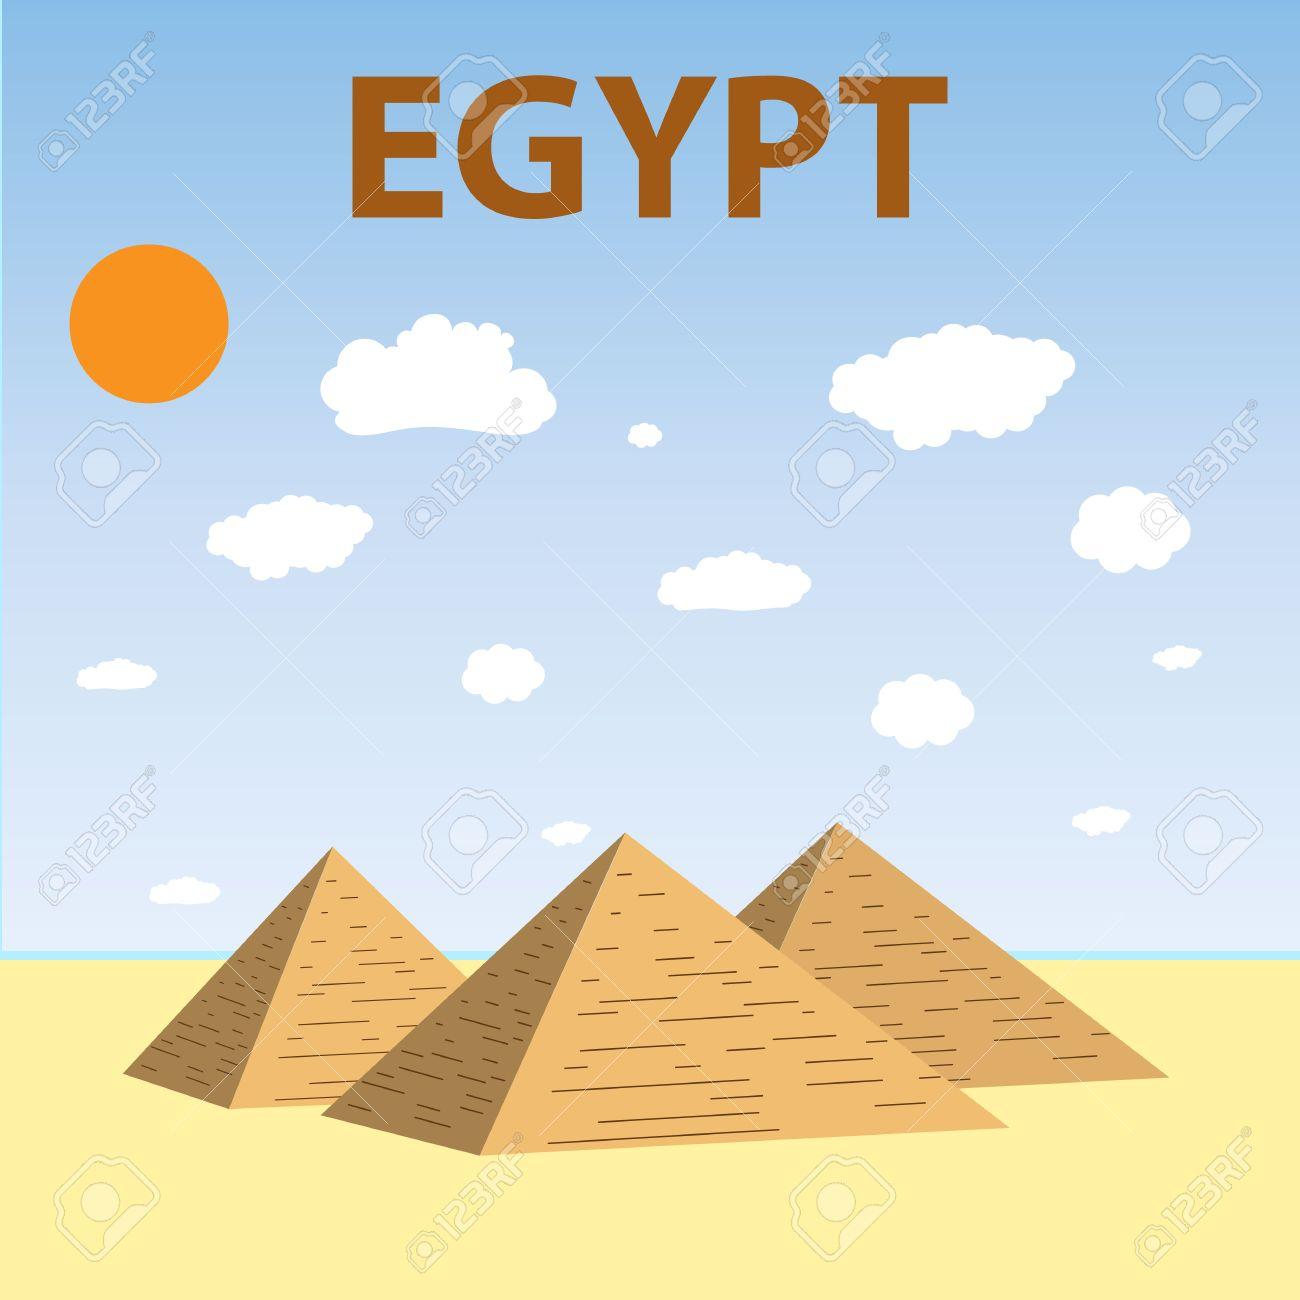 Flat Design Of Three Egypt Pyramids Vector Pyramids Giza Tourism Royalty Free Cliparts Vectors And Stock Illustration Image 55052798